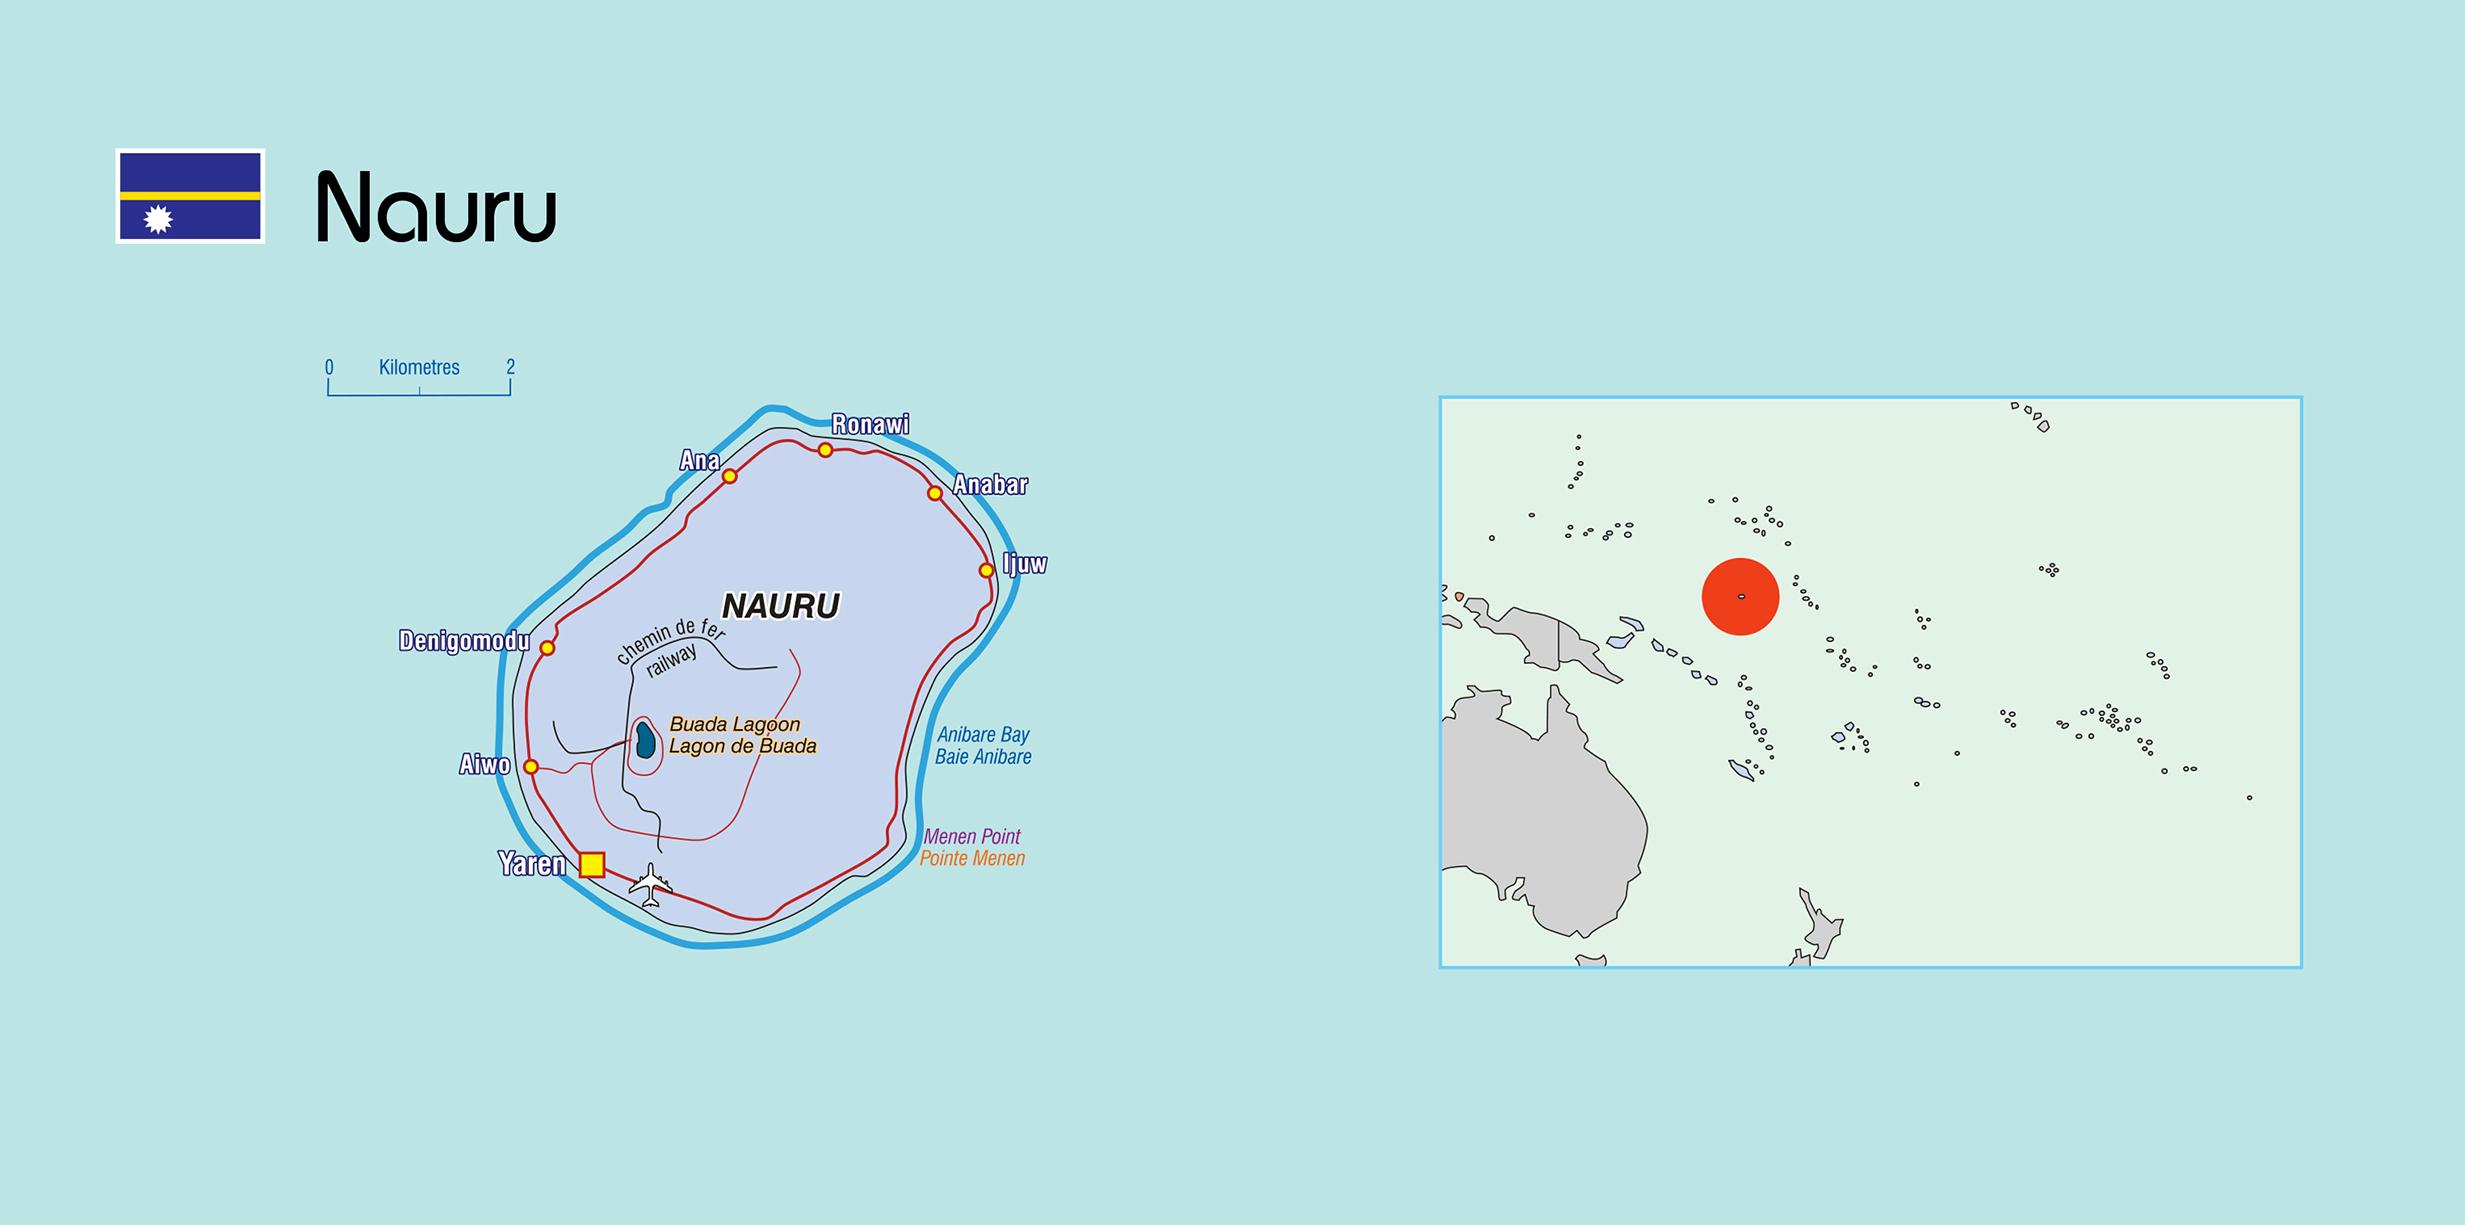 Large political map of Nauru with other marks | Nauru ... on tuvalu map, east timor map, saint kitts and nevis map, libya map, mauritius map, kiribati map, monaco map, liechtenstein map, morocco map, wake island map, new caledonia map, rwanda map, liberia map, algeria map, mauritania map, mozambique map, papua nueva guinea map, kenya map, congo map, senegal map, zimbabwe map, malawi map, new zealand map, sudan map, madagascar map, the marshall islands map, niue map, ghana map, mali map, namibia map, burundi map, saint pierre and miquelon map, tunisia map, angola map, niger map, timor-leste map, solomon islands map, cook islands map, netherlands map, oceania map,